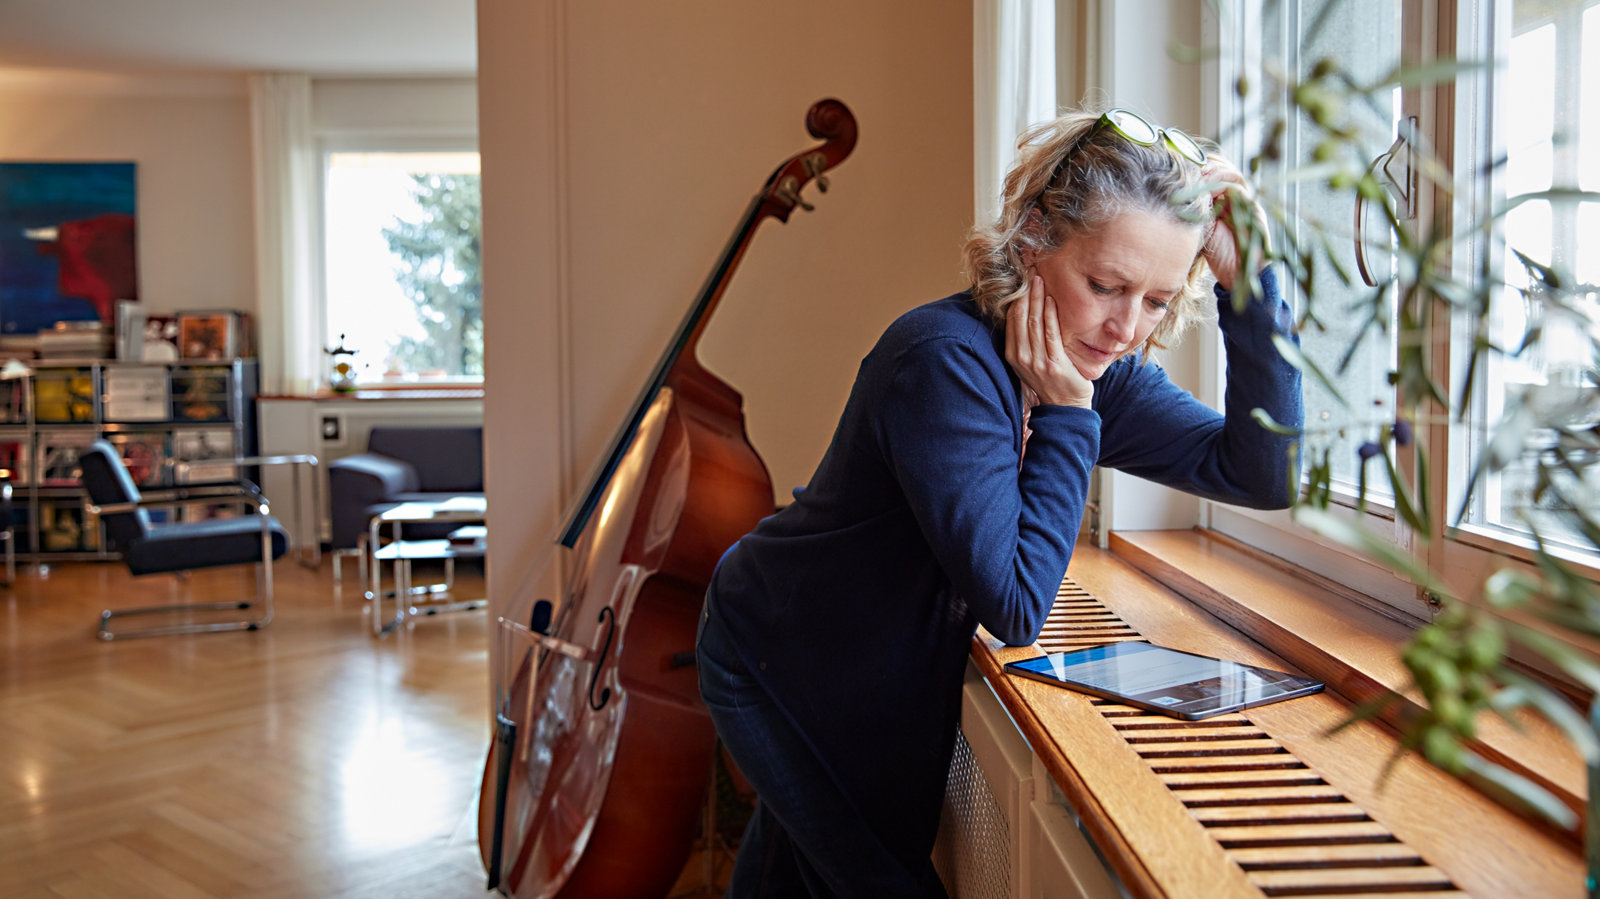 Frau studiert Tablet vor ihrem Cello am Fenster